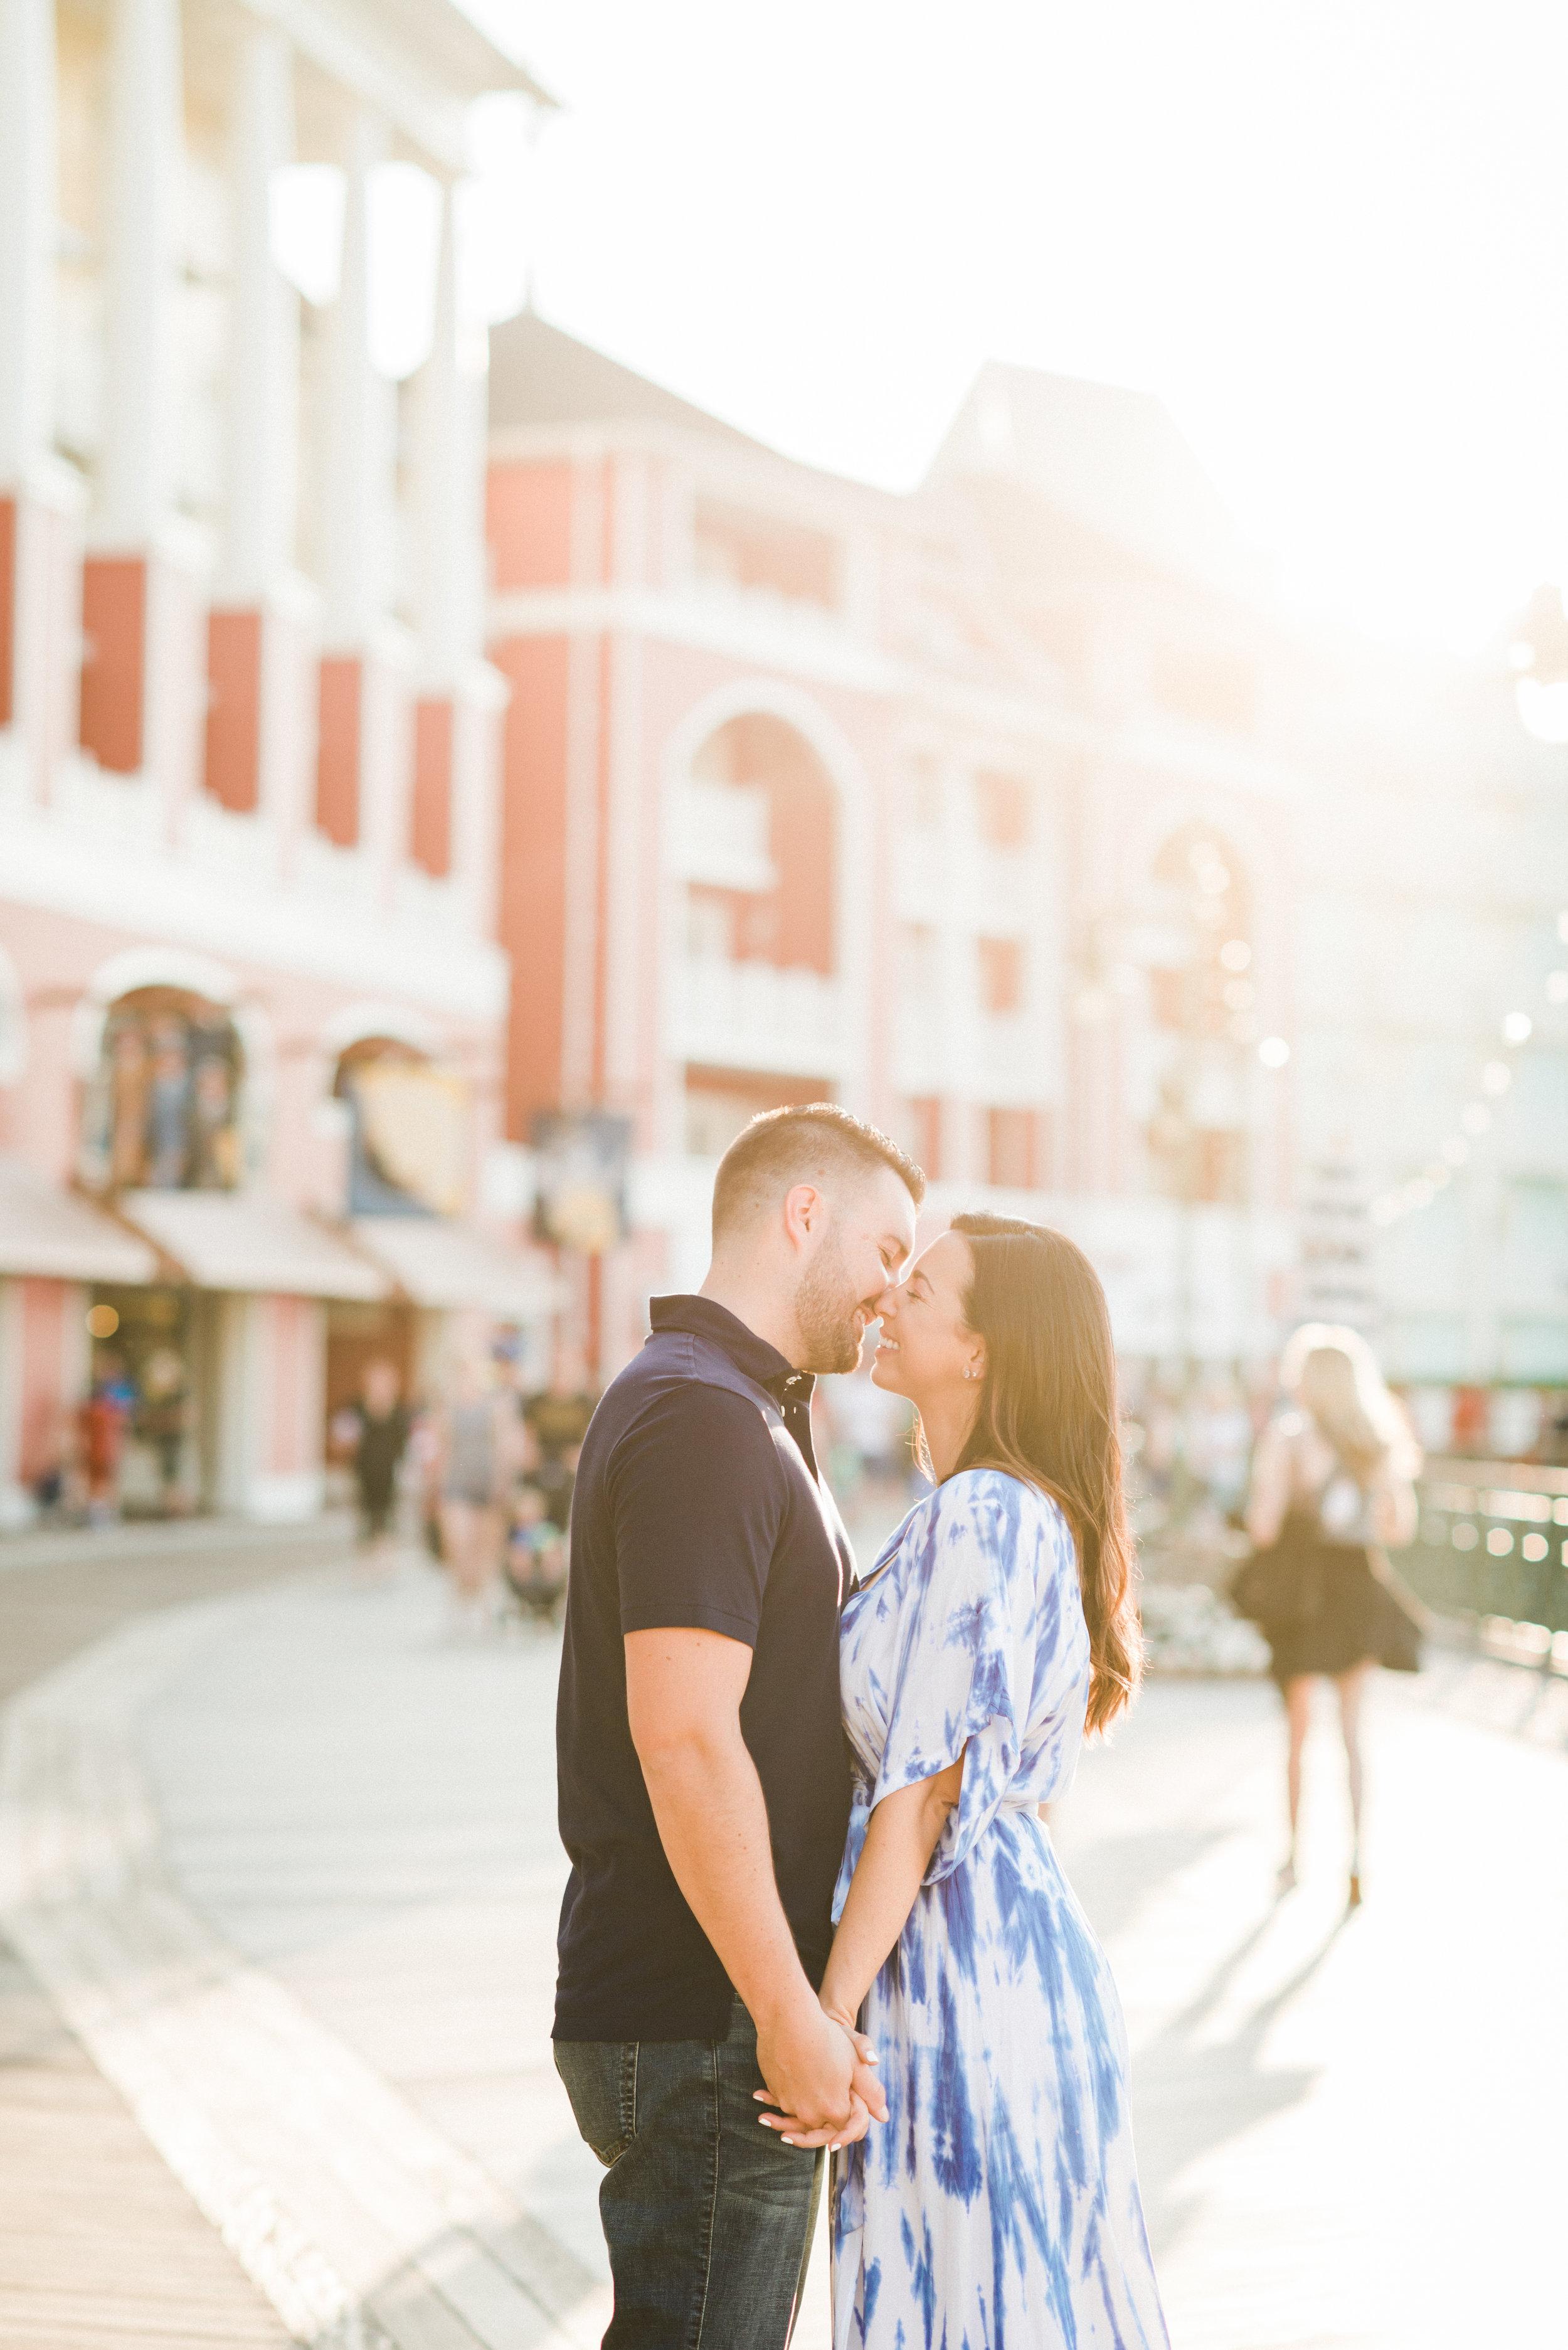 KateTaramykinStudios-Disney-Boardwalk-Couples-Portraits-KatMarc-13.jpg